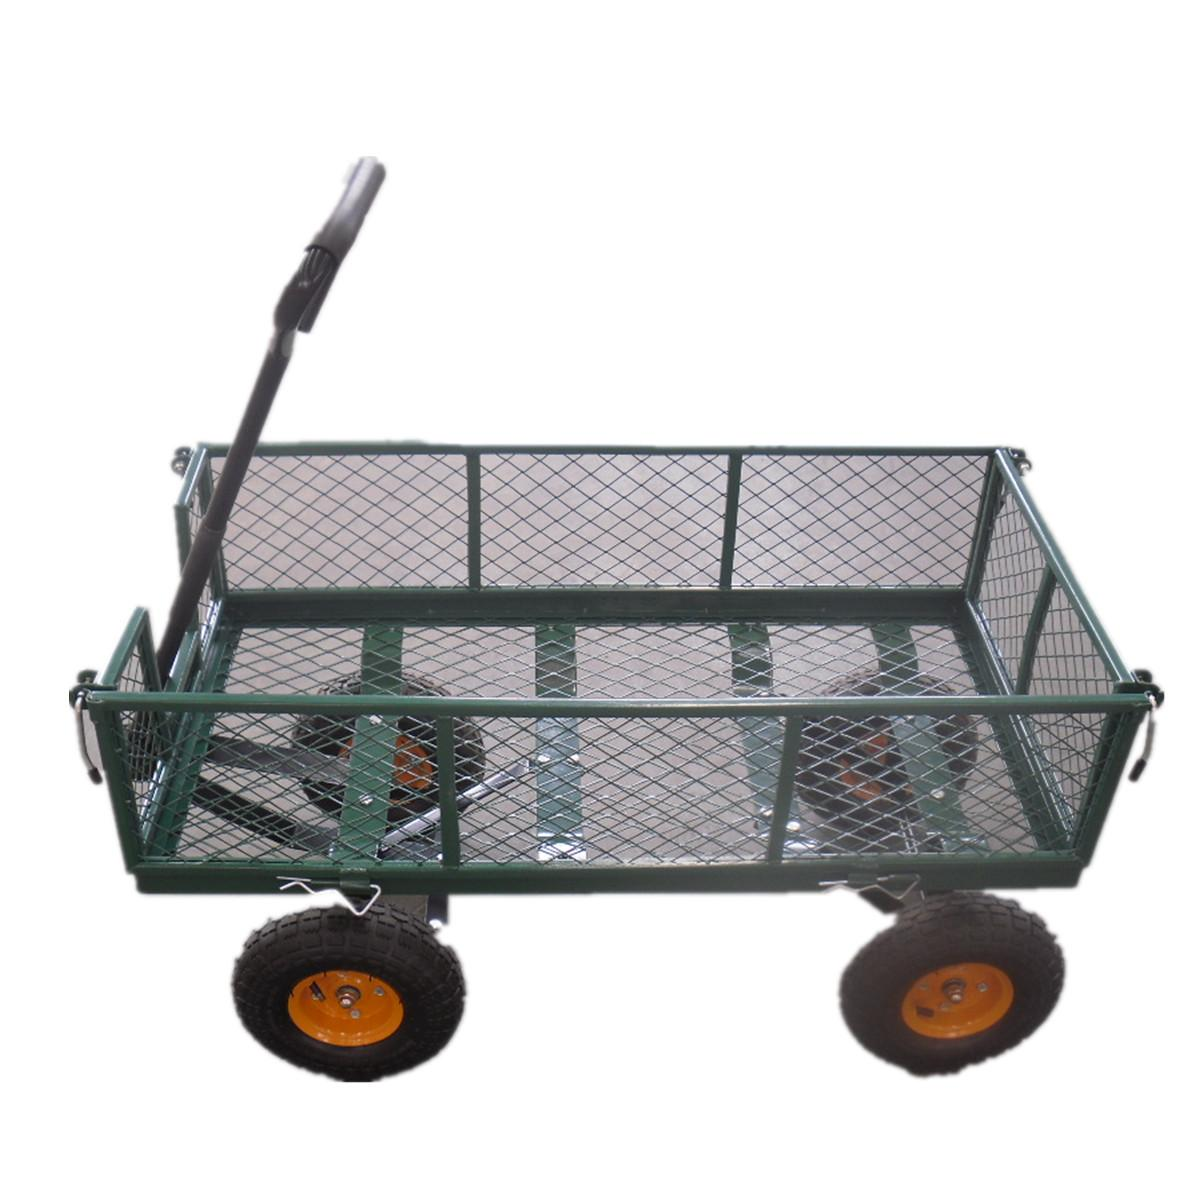 4 Wheel Heavy Duty Garden Outdoor Utility Cart Truck Trolley Garden Cart  Wheel Barrow Tipper Tippping Dump Trailer